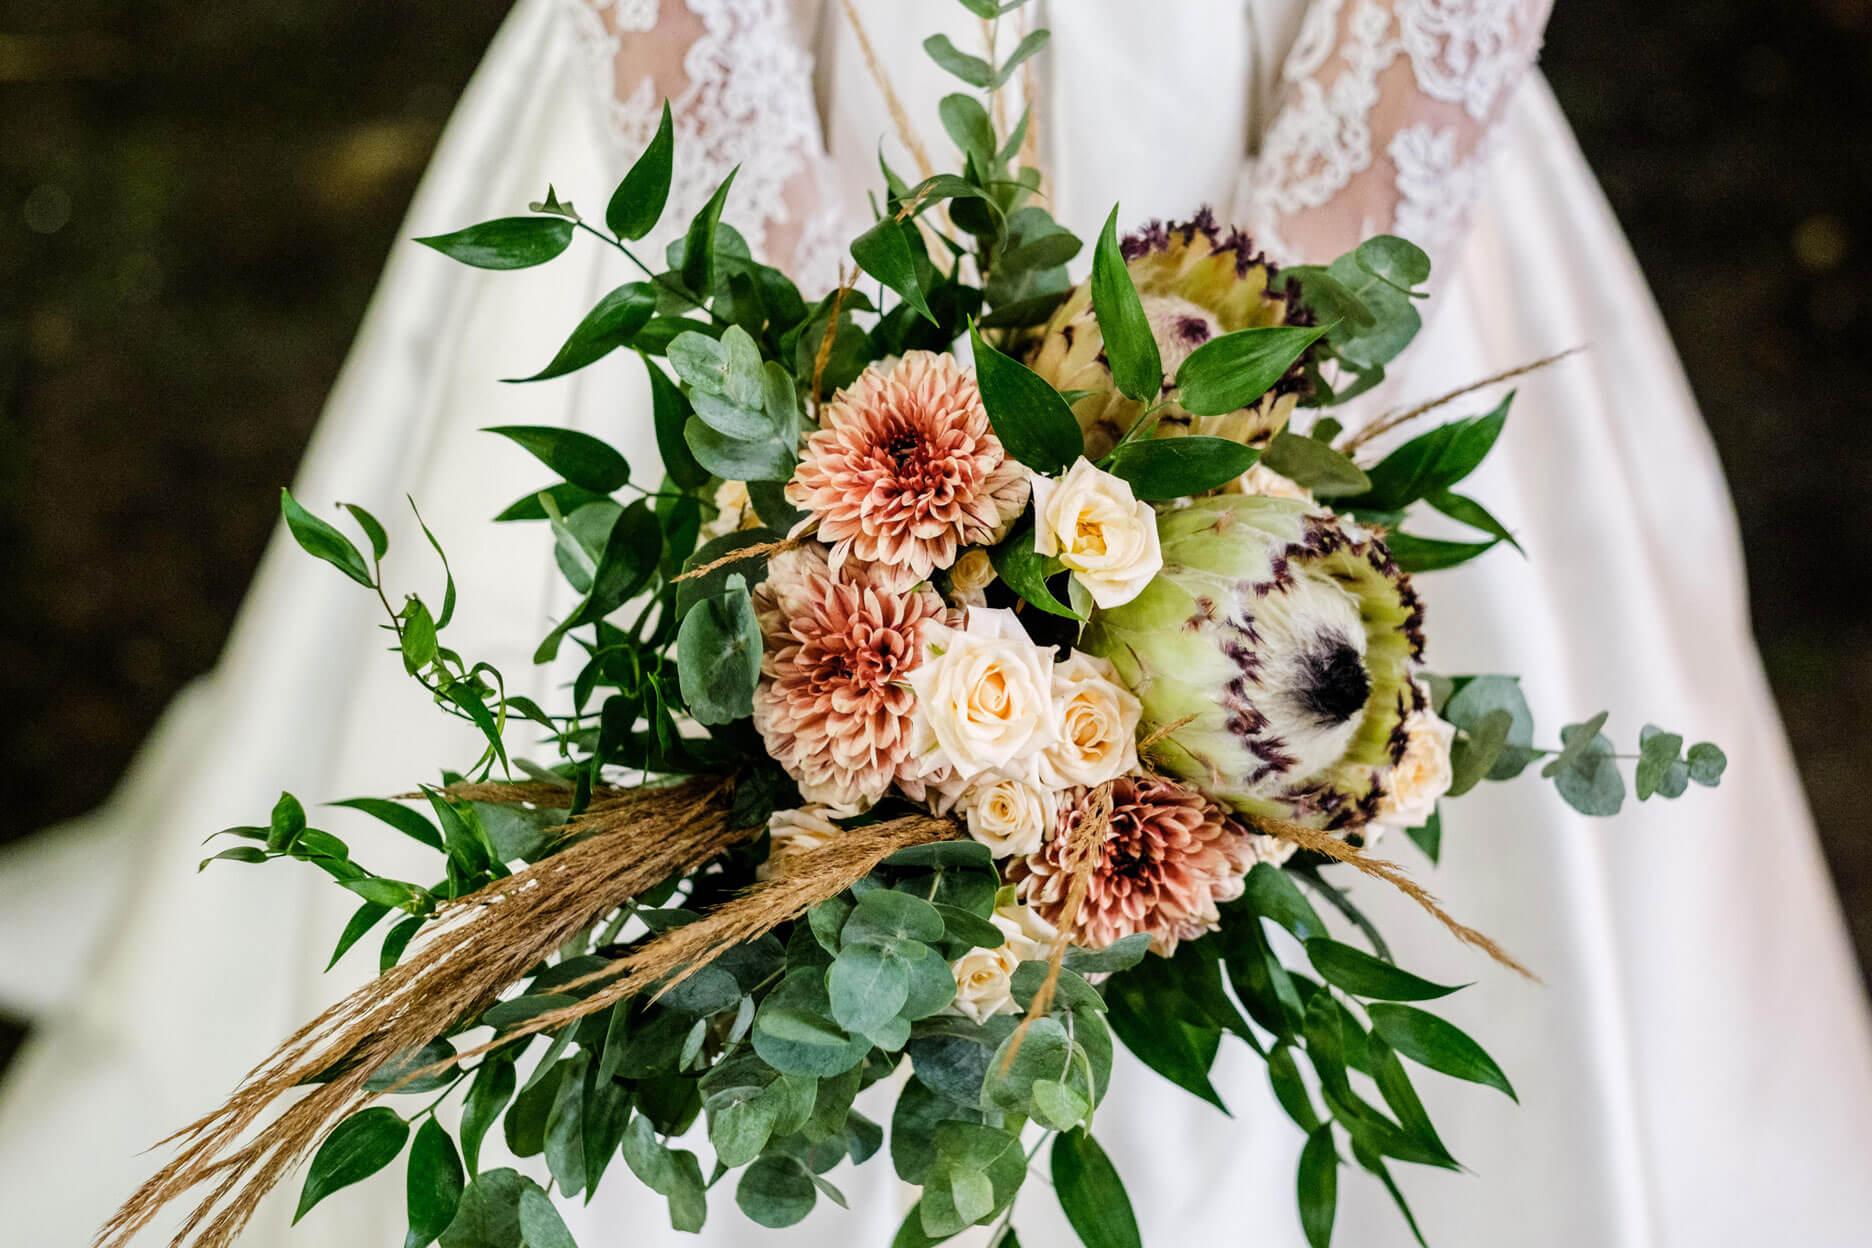 Bouquet de mariée signé Serre Sauvage